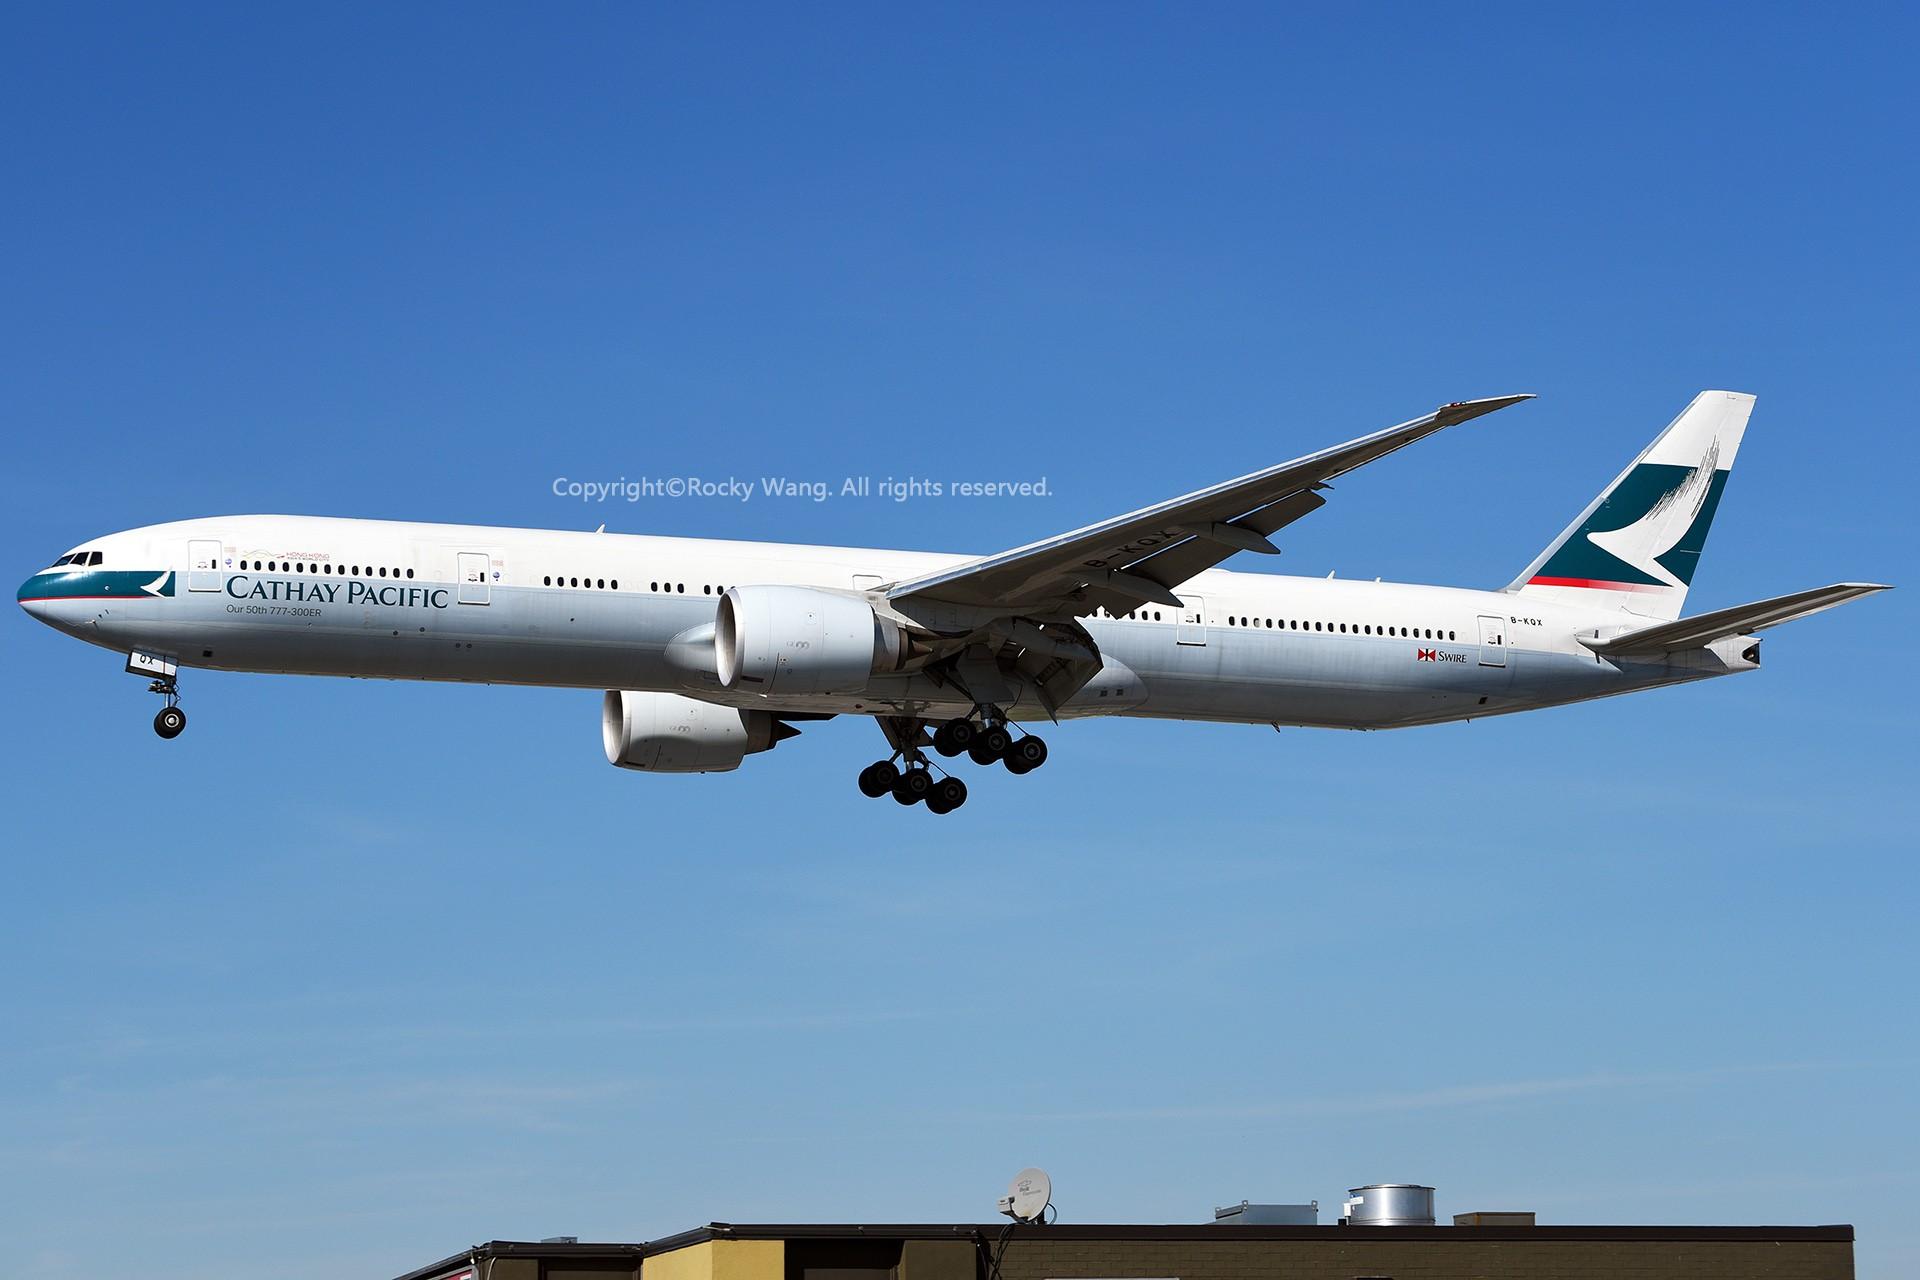 Re:[原创]CYYZ 30图 BOEING 777-367ER B-KQX Toronto Lester B. Pearson Int'l Airport